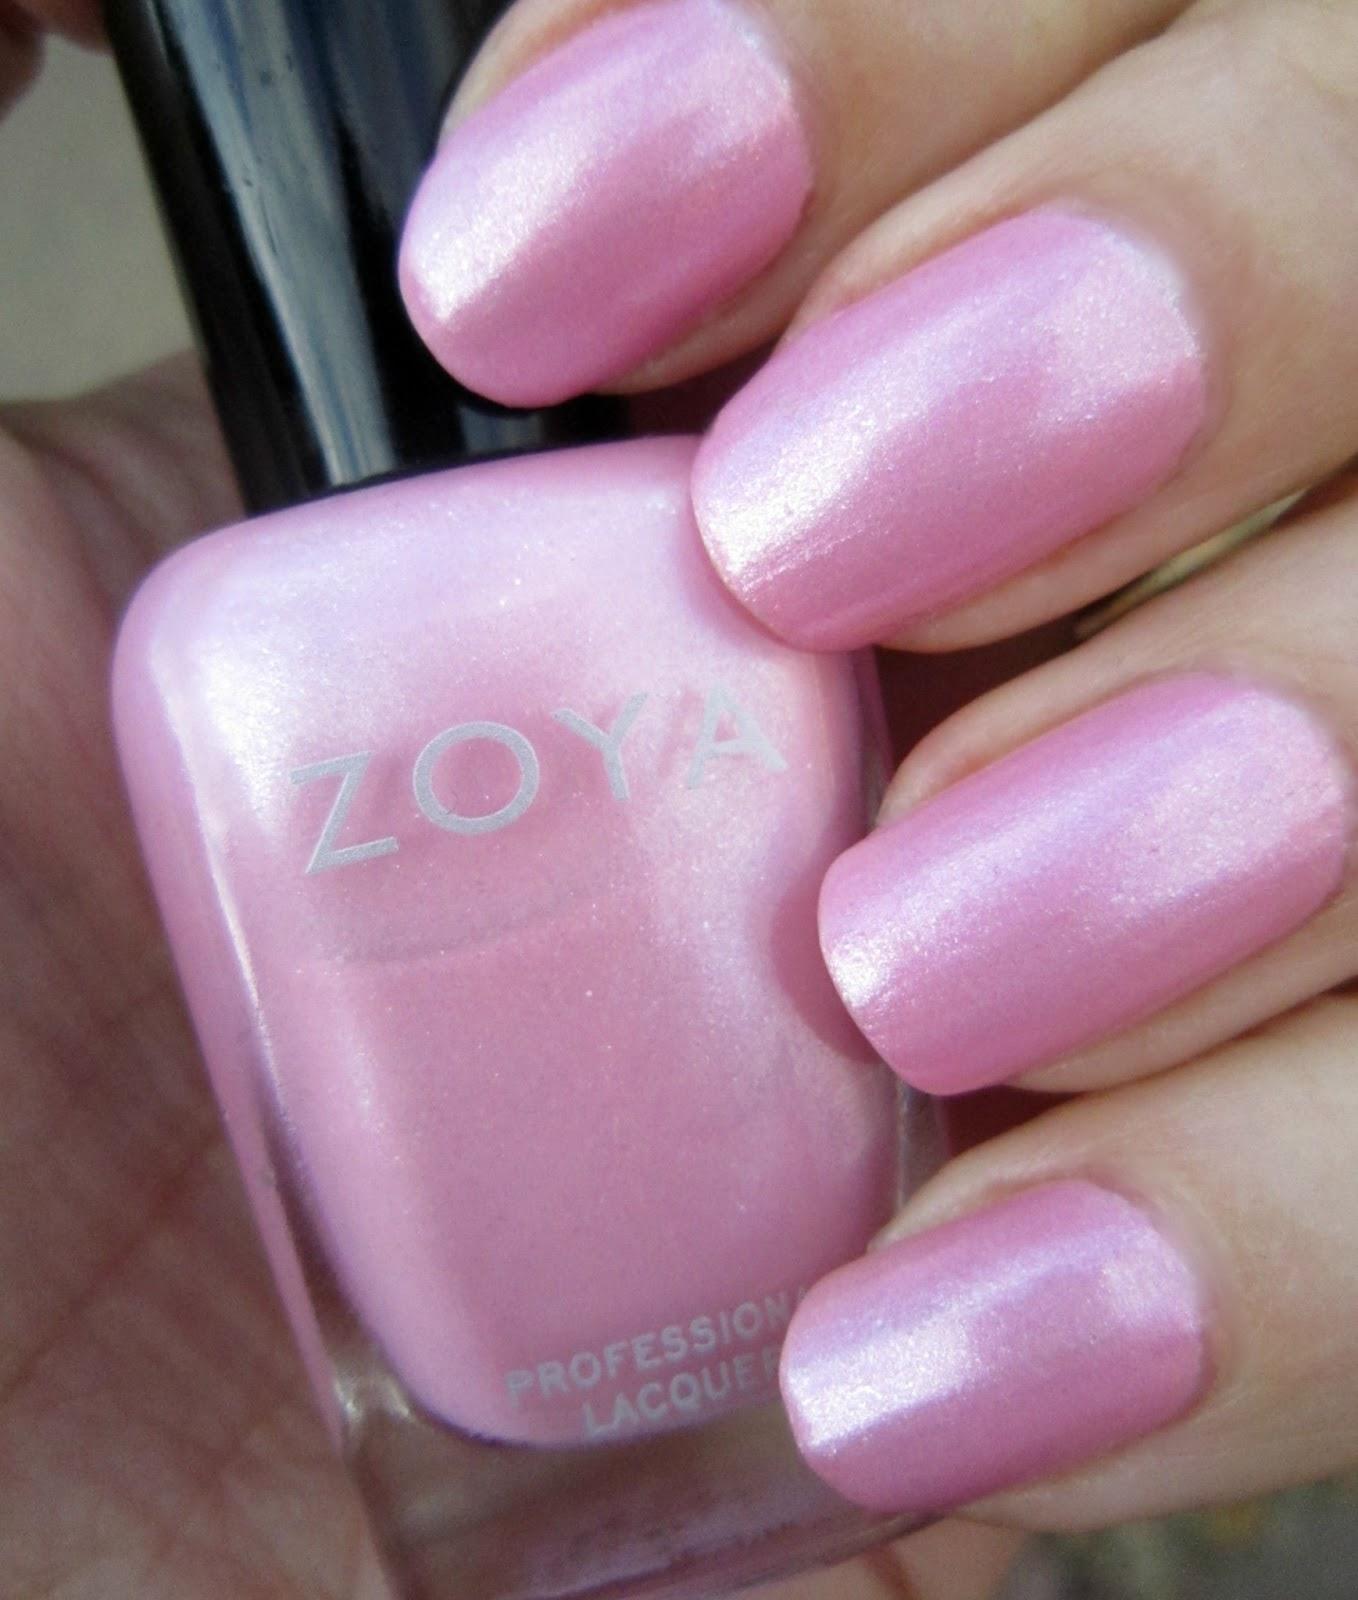 Concrete and Nail Polish: Zoya Gie Gie